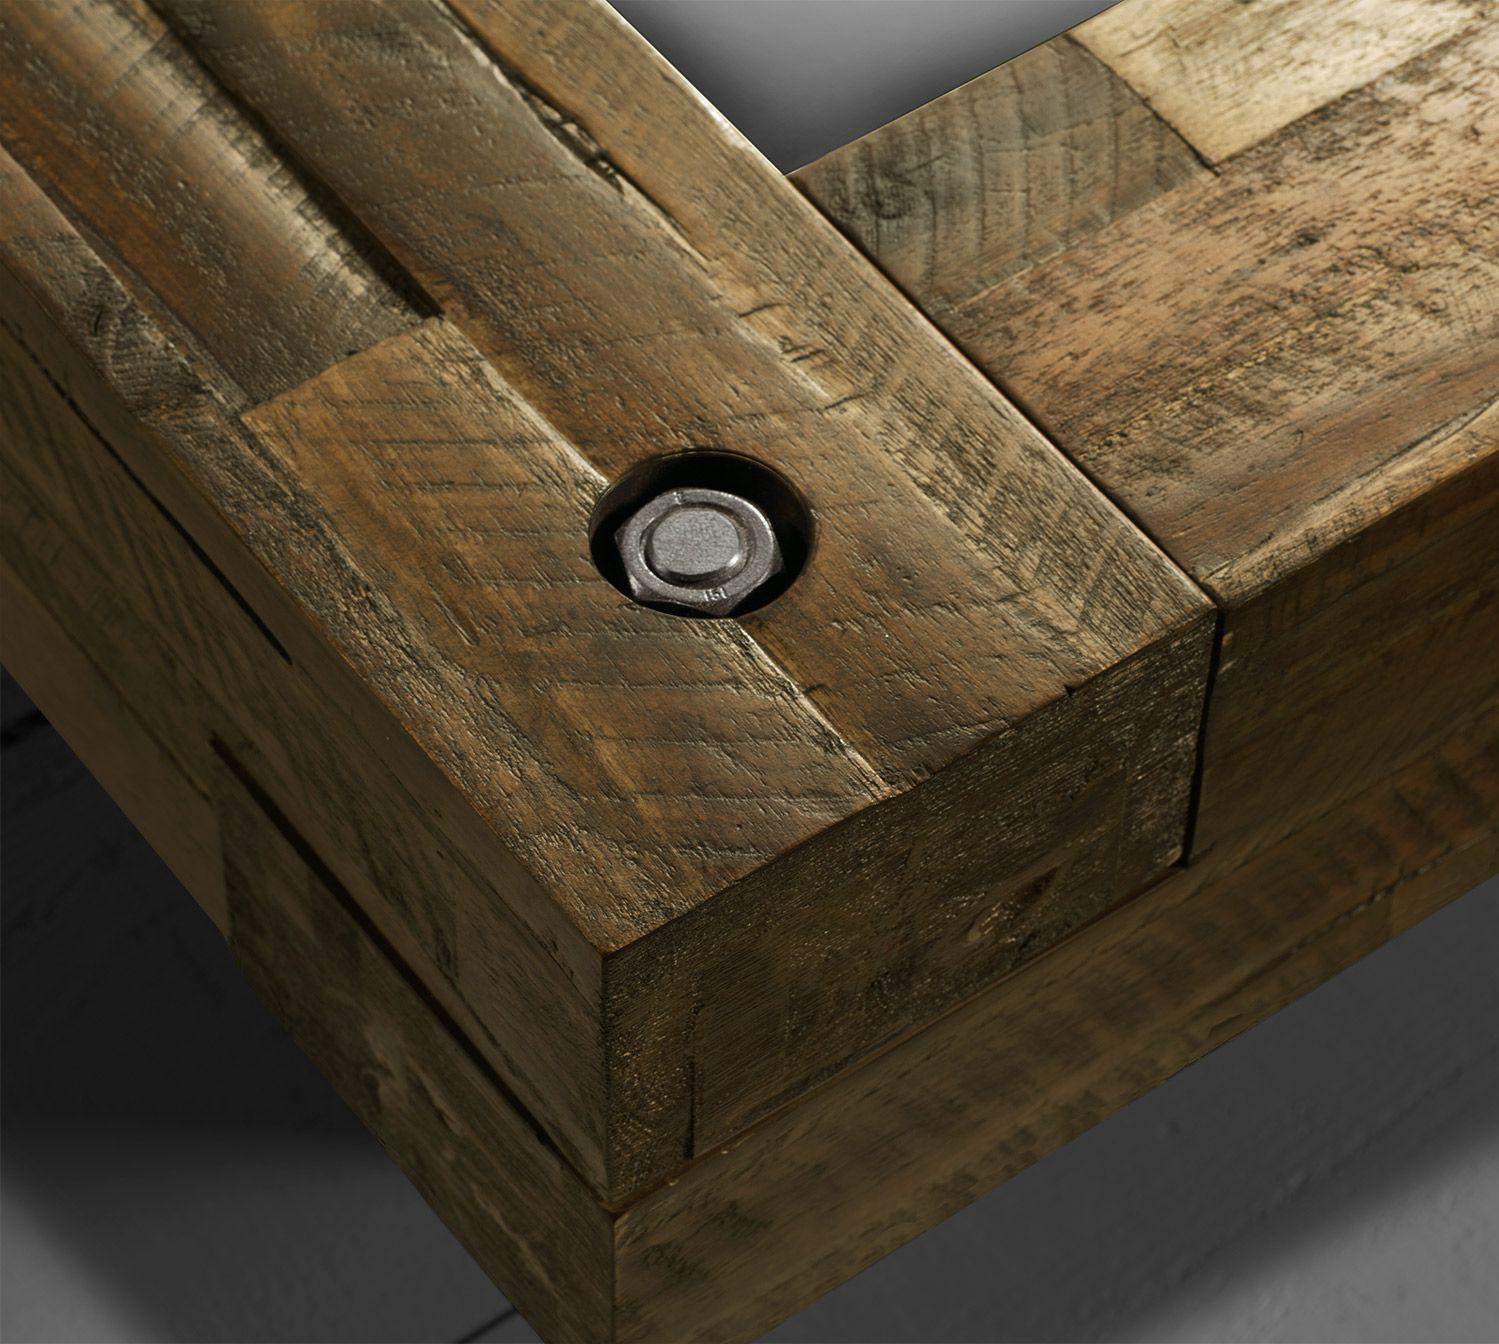 Bett im Industrielook aus Massivholz kaufen - Molina